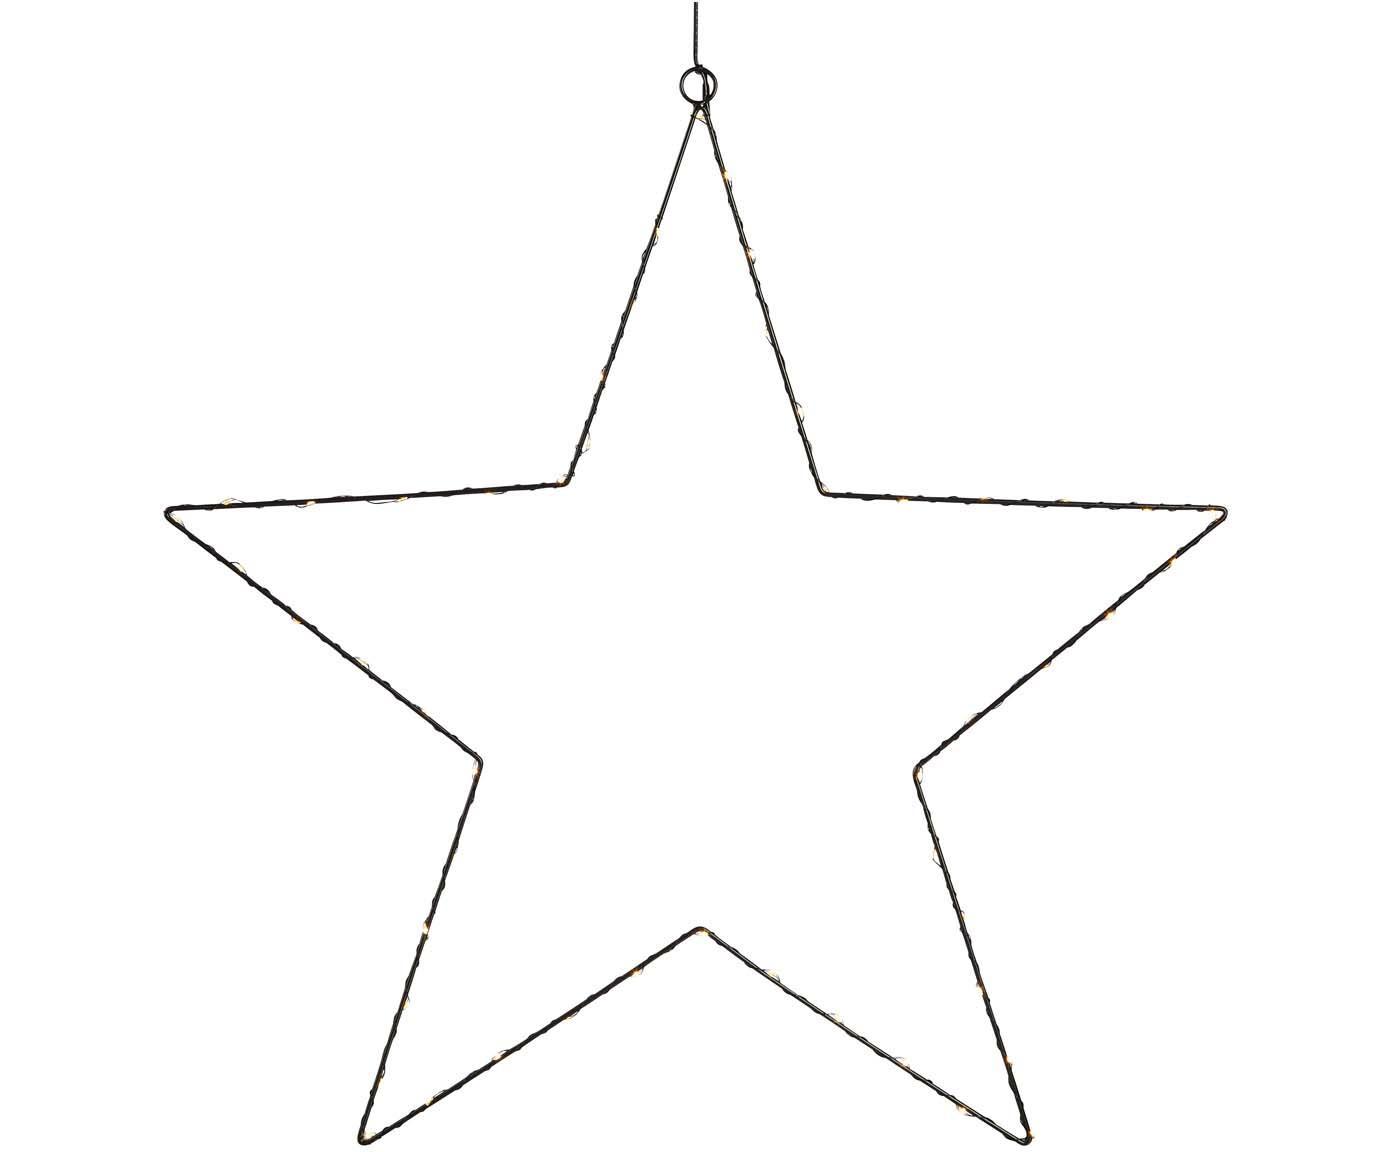 LED lichtobject Nordgard, Gelakt metaal, Zwart, Ø 60 cm